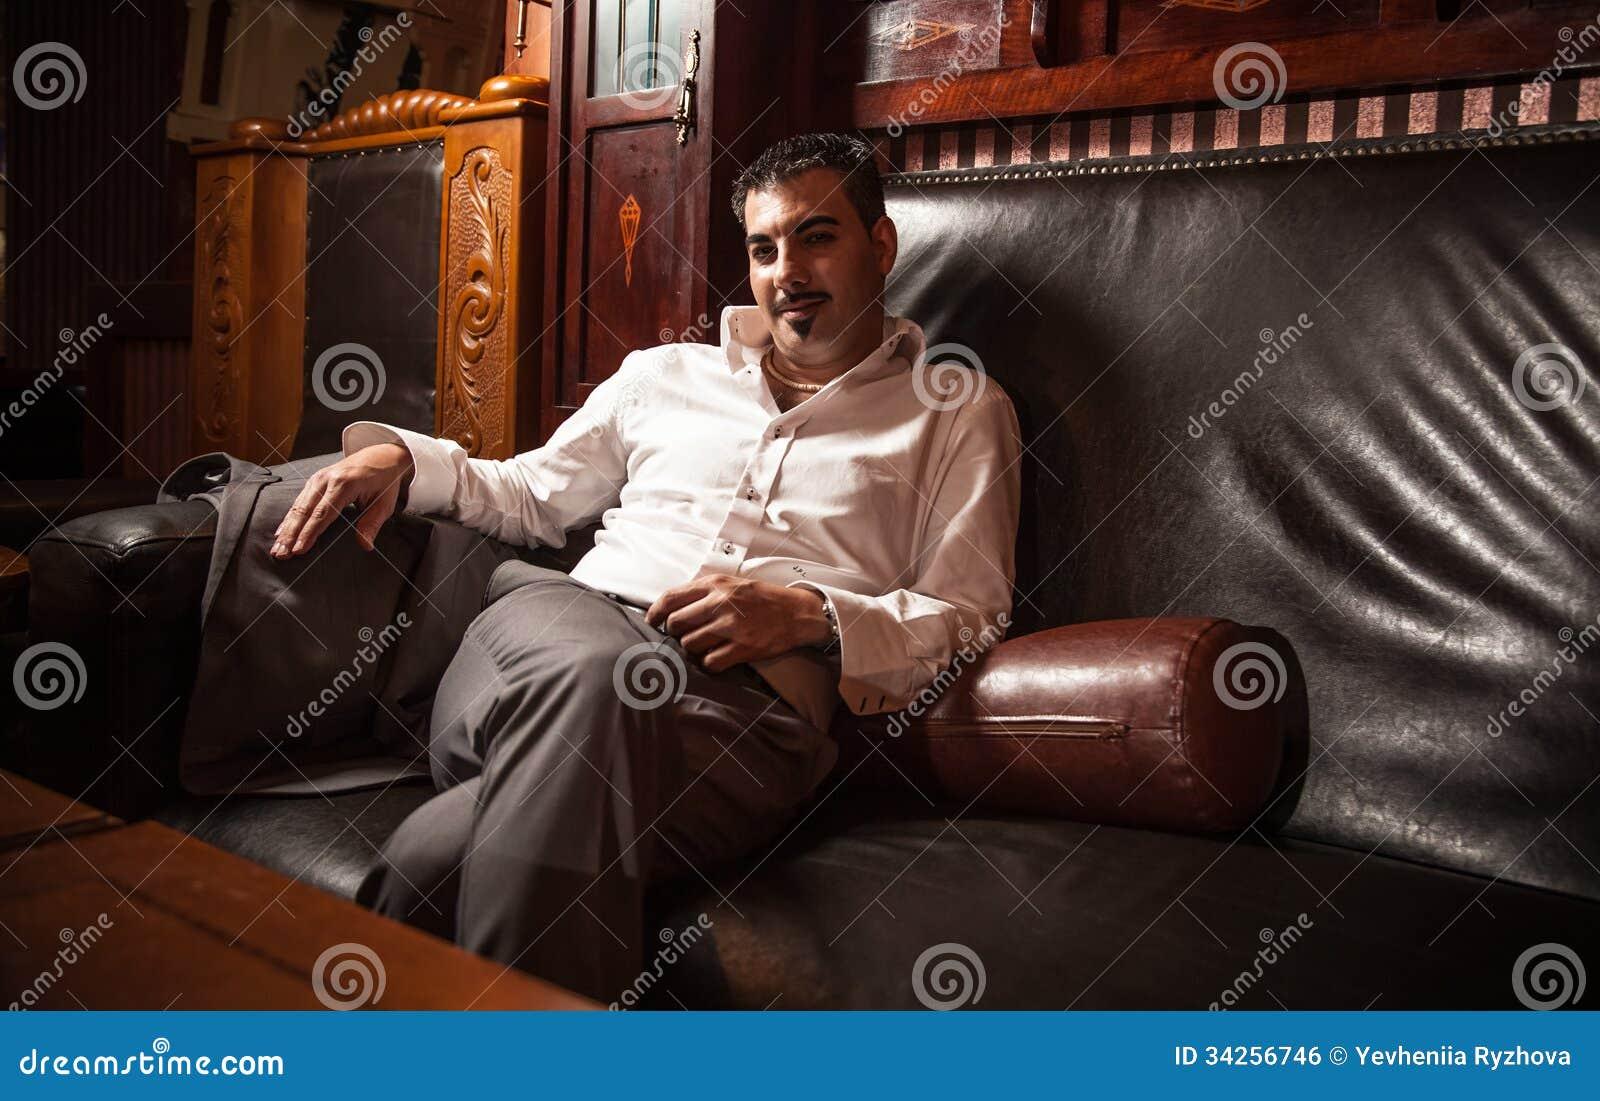 Rich Man Sitting On Vintage Leather Sofa Royalty Free